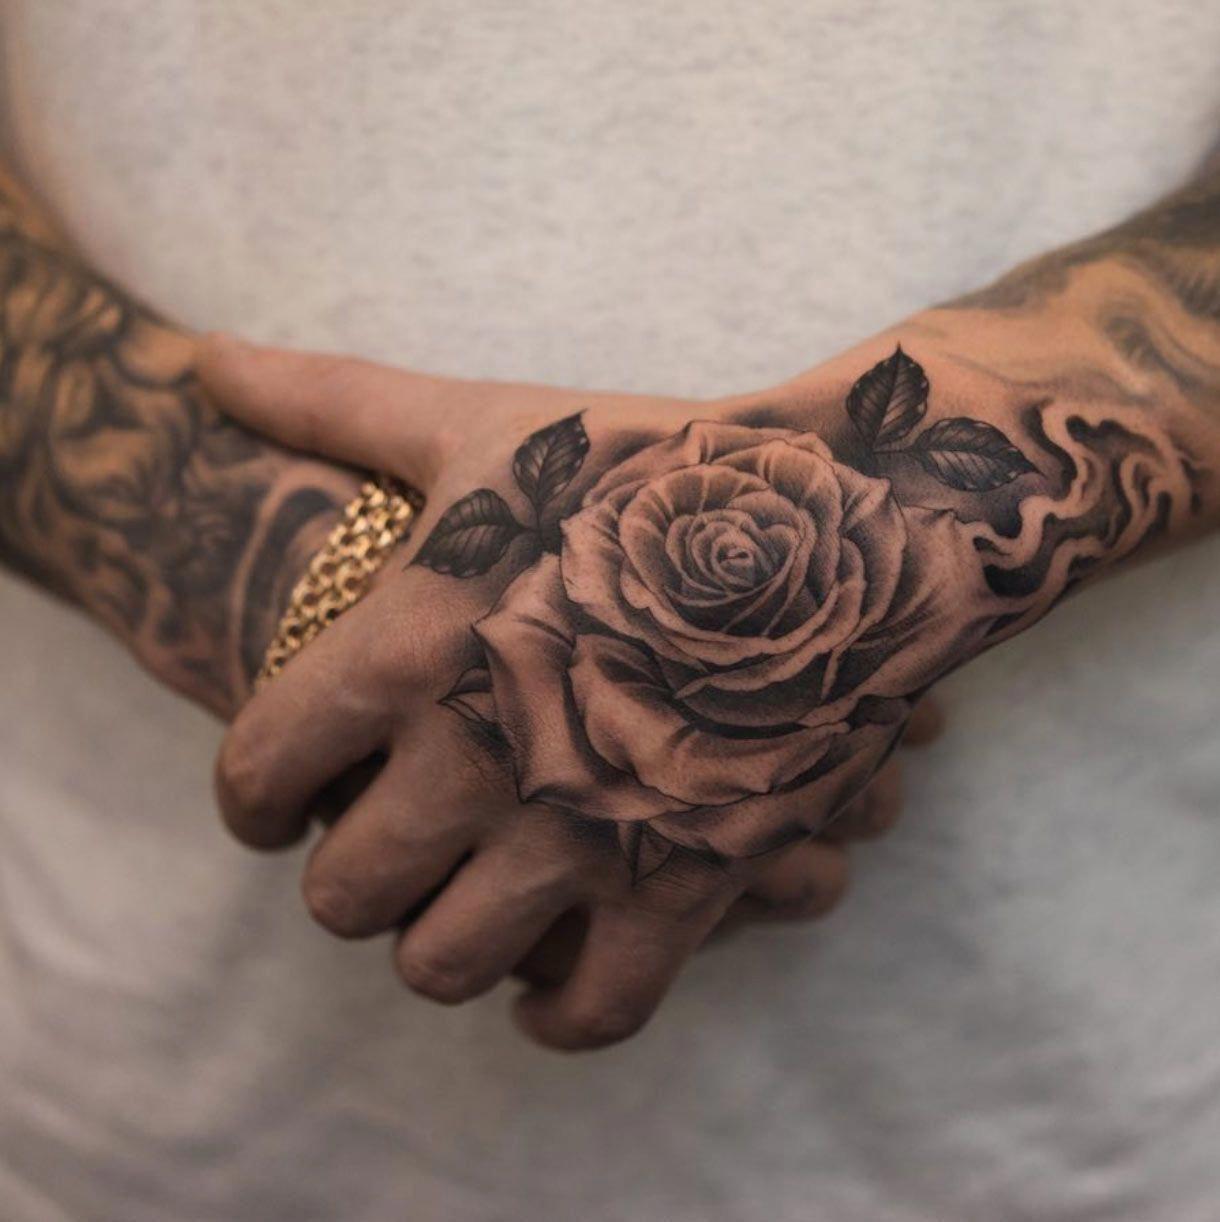 Tattoos For Men On Neck Tattoosformen Rose Tattoos For Men Hand Tattoos For Guys Tattoos For Guys